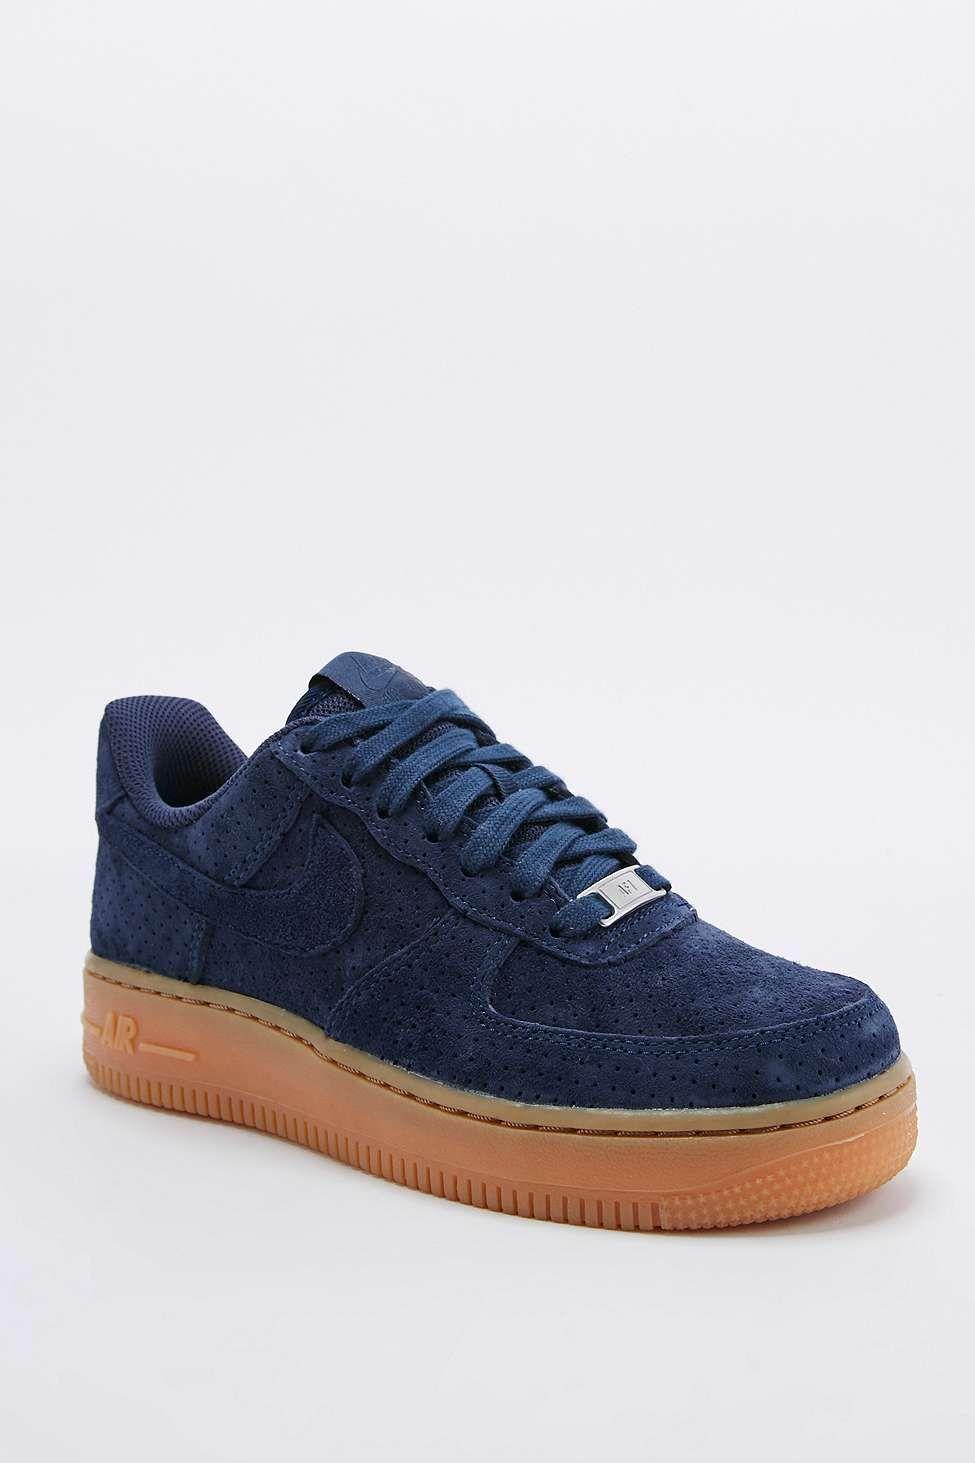 bas prix d1ced 13e16 Nike - Baskets montantes Air Force 1 en daim bleu marine ...